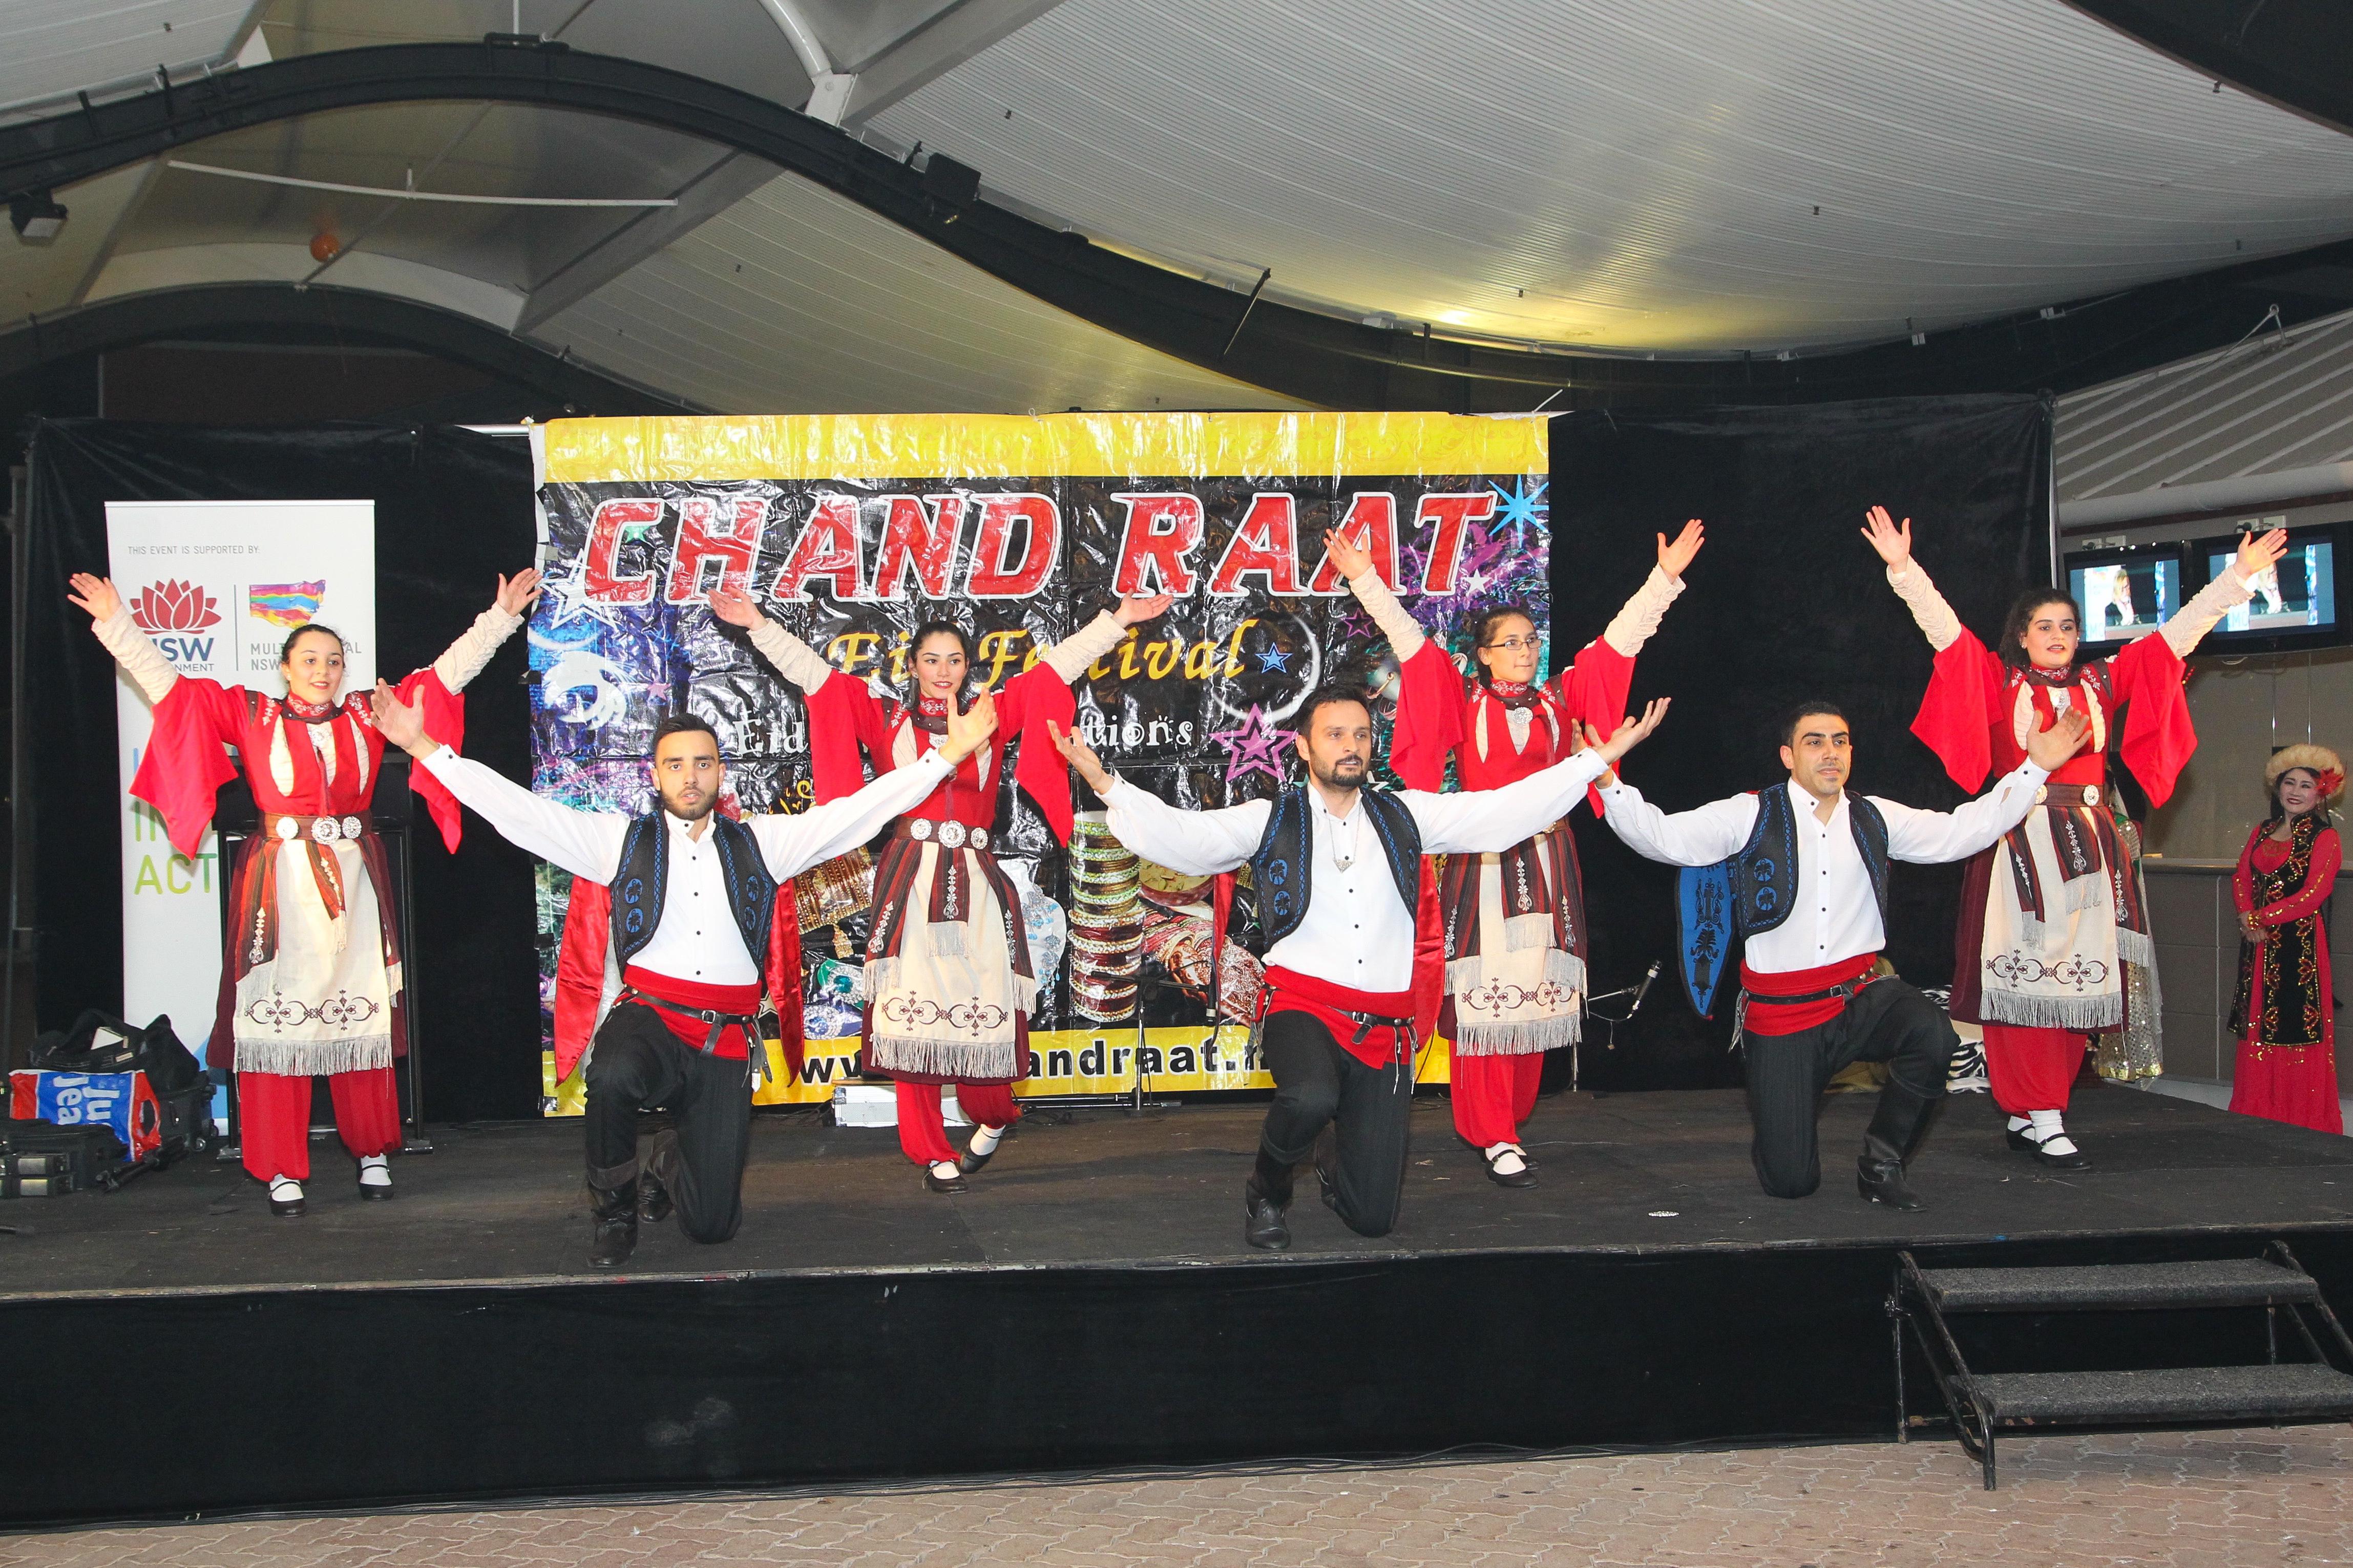 Good Chand Raat Eid Al-Fitr 2018 - Turkish-Cultral-dance-in-Chand-Raat  Best Photo Reference_14917 .jpg